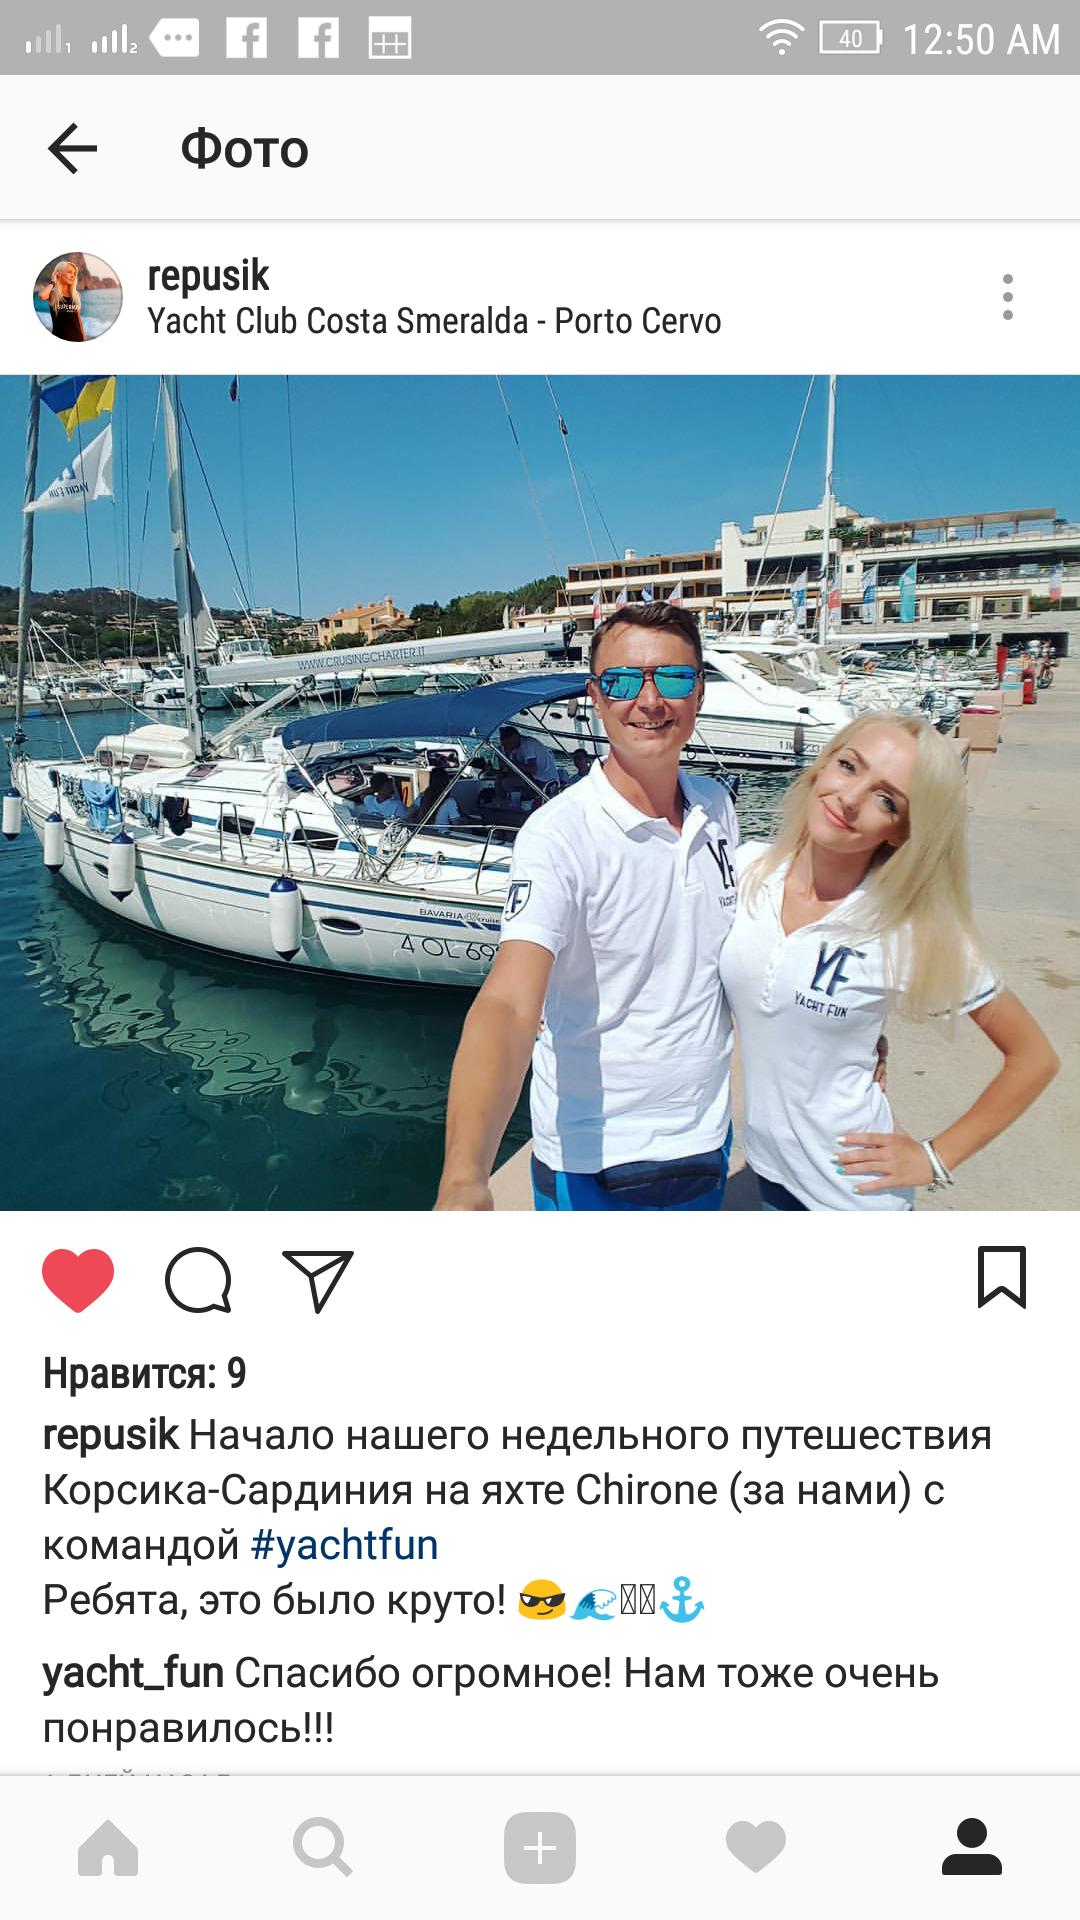 Отзыв о Яхтфане